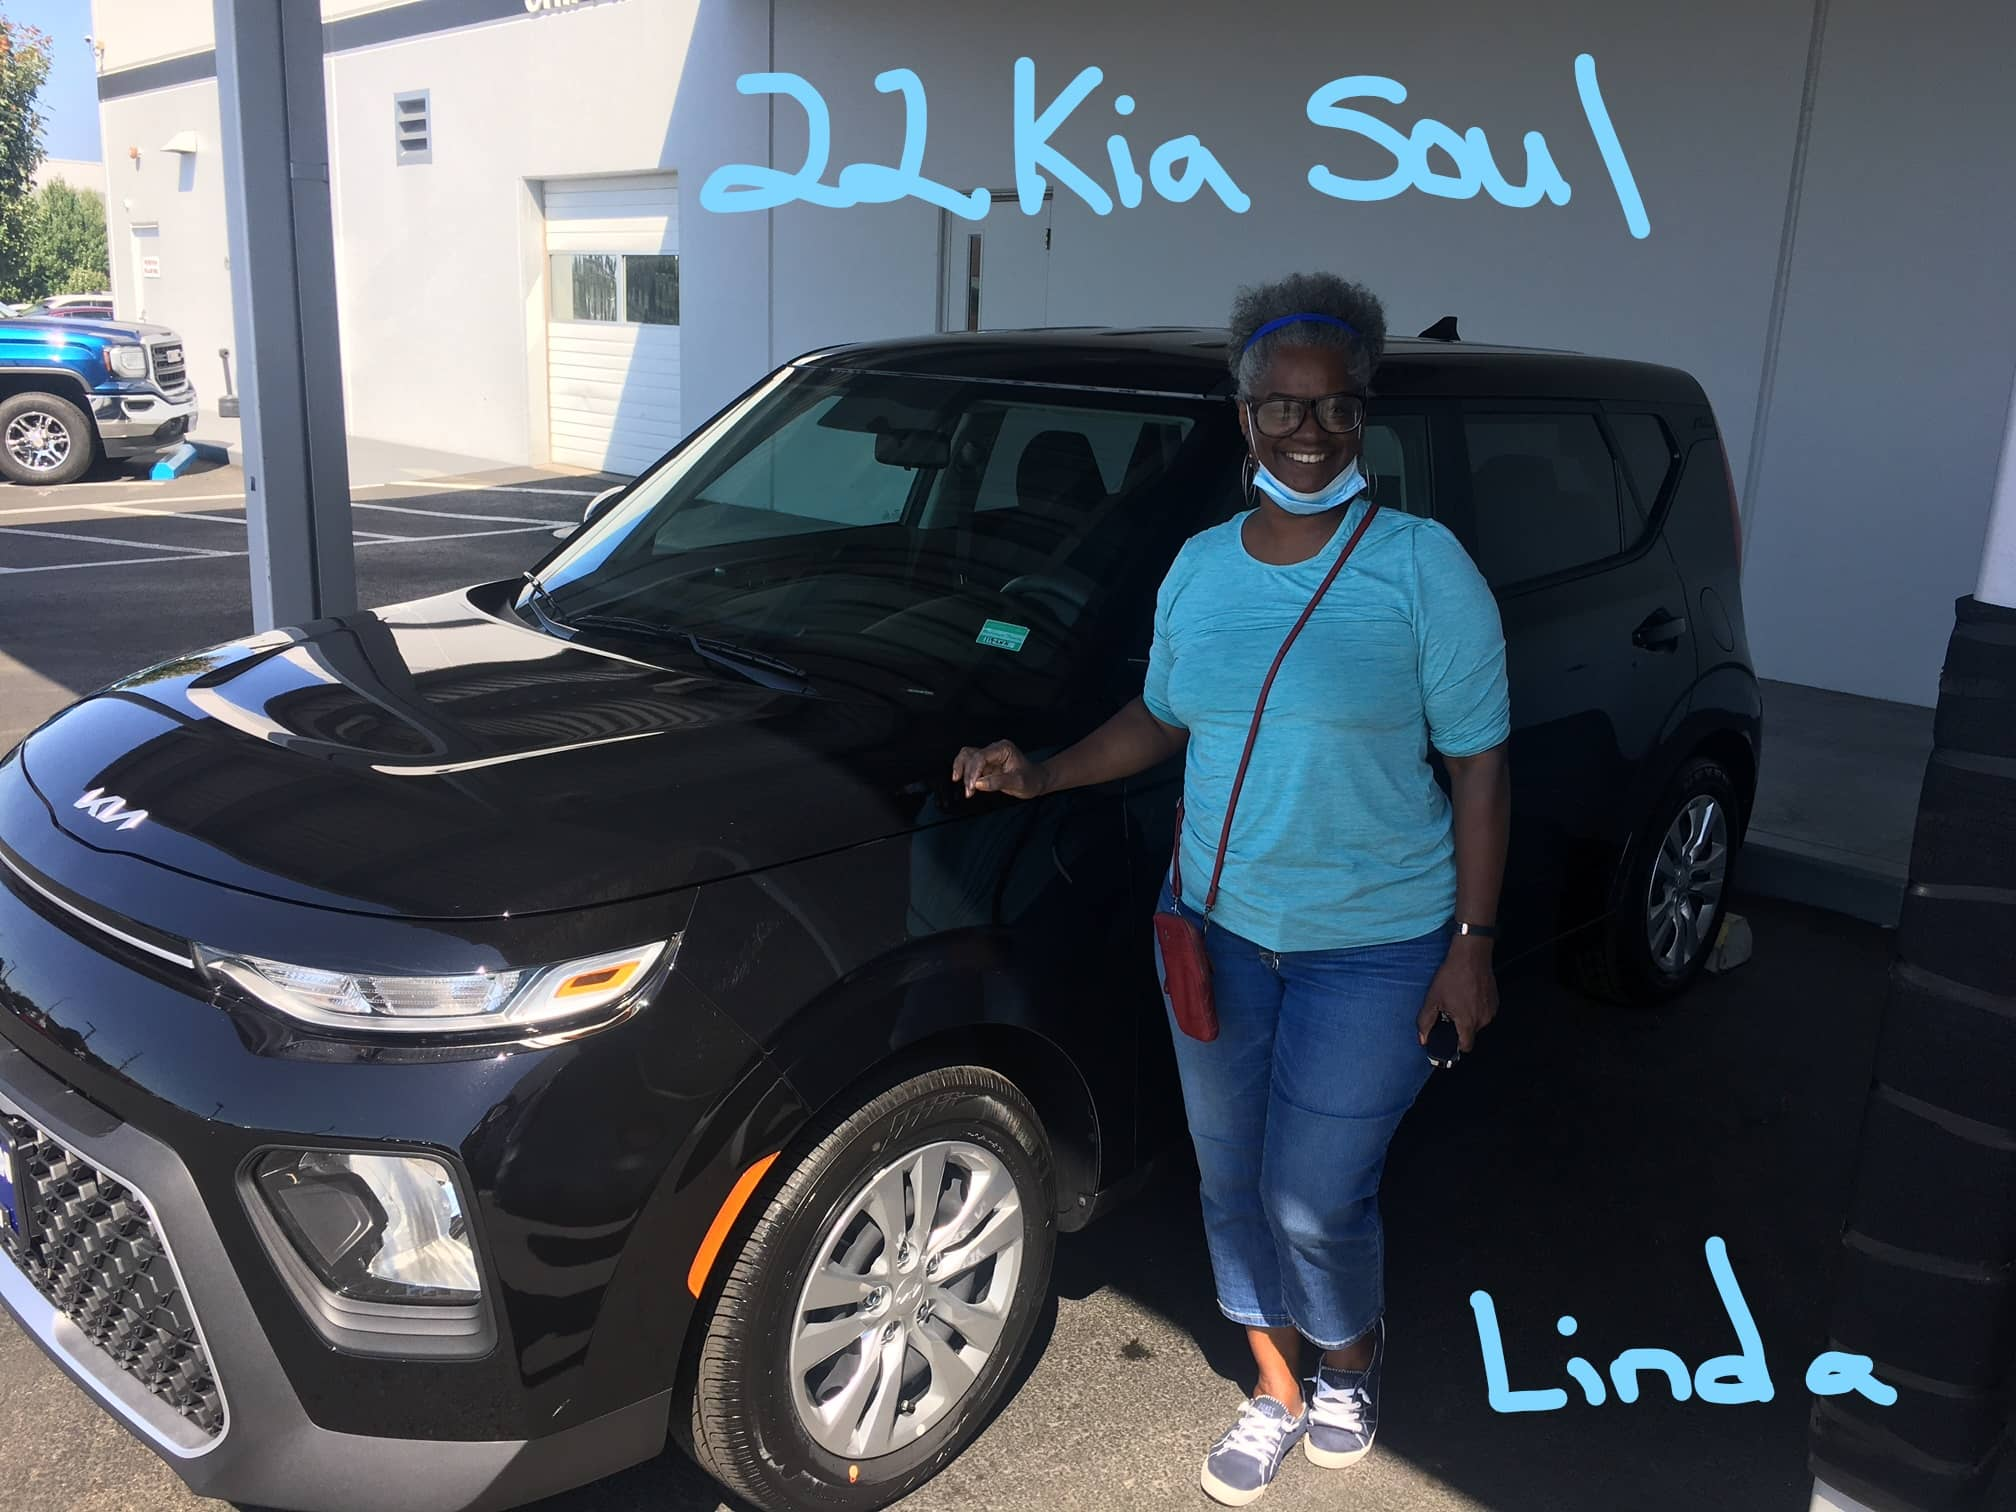 22 Kia Soul Linda